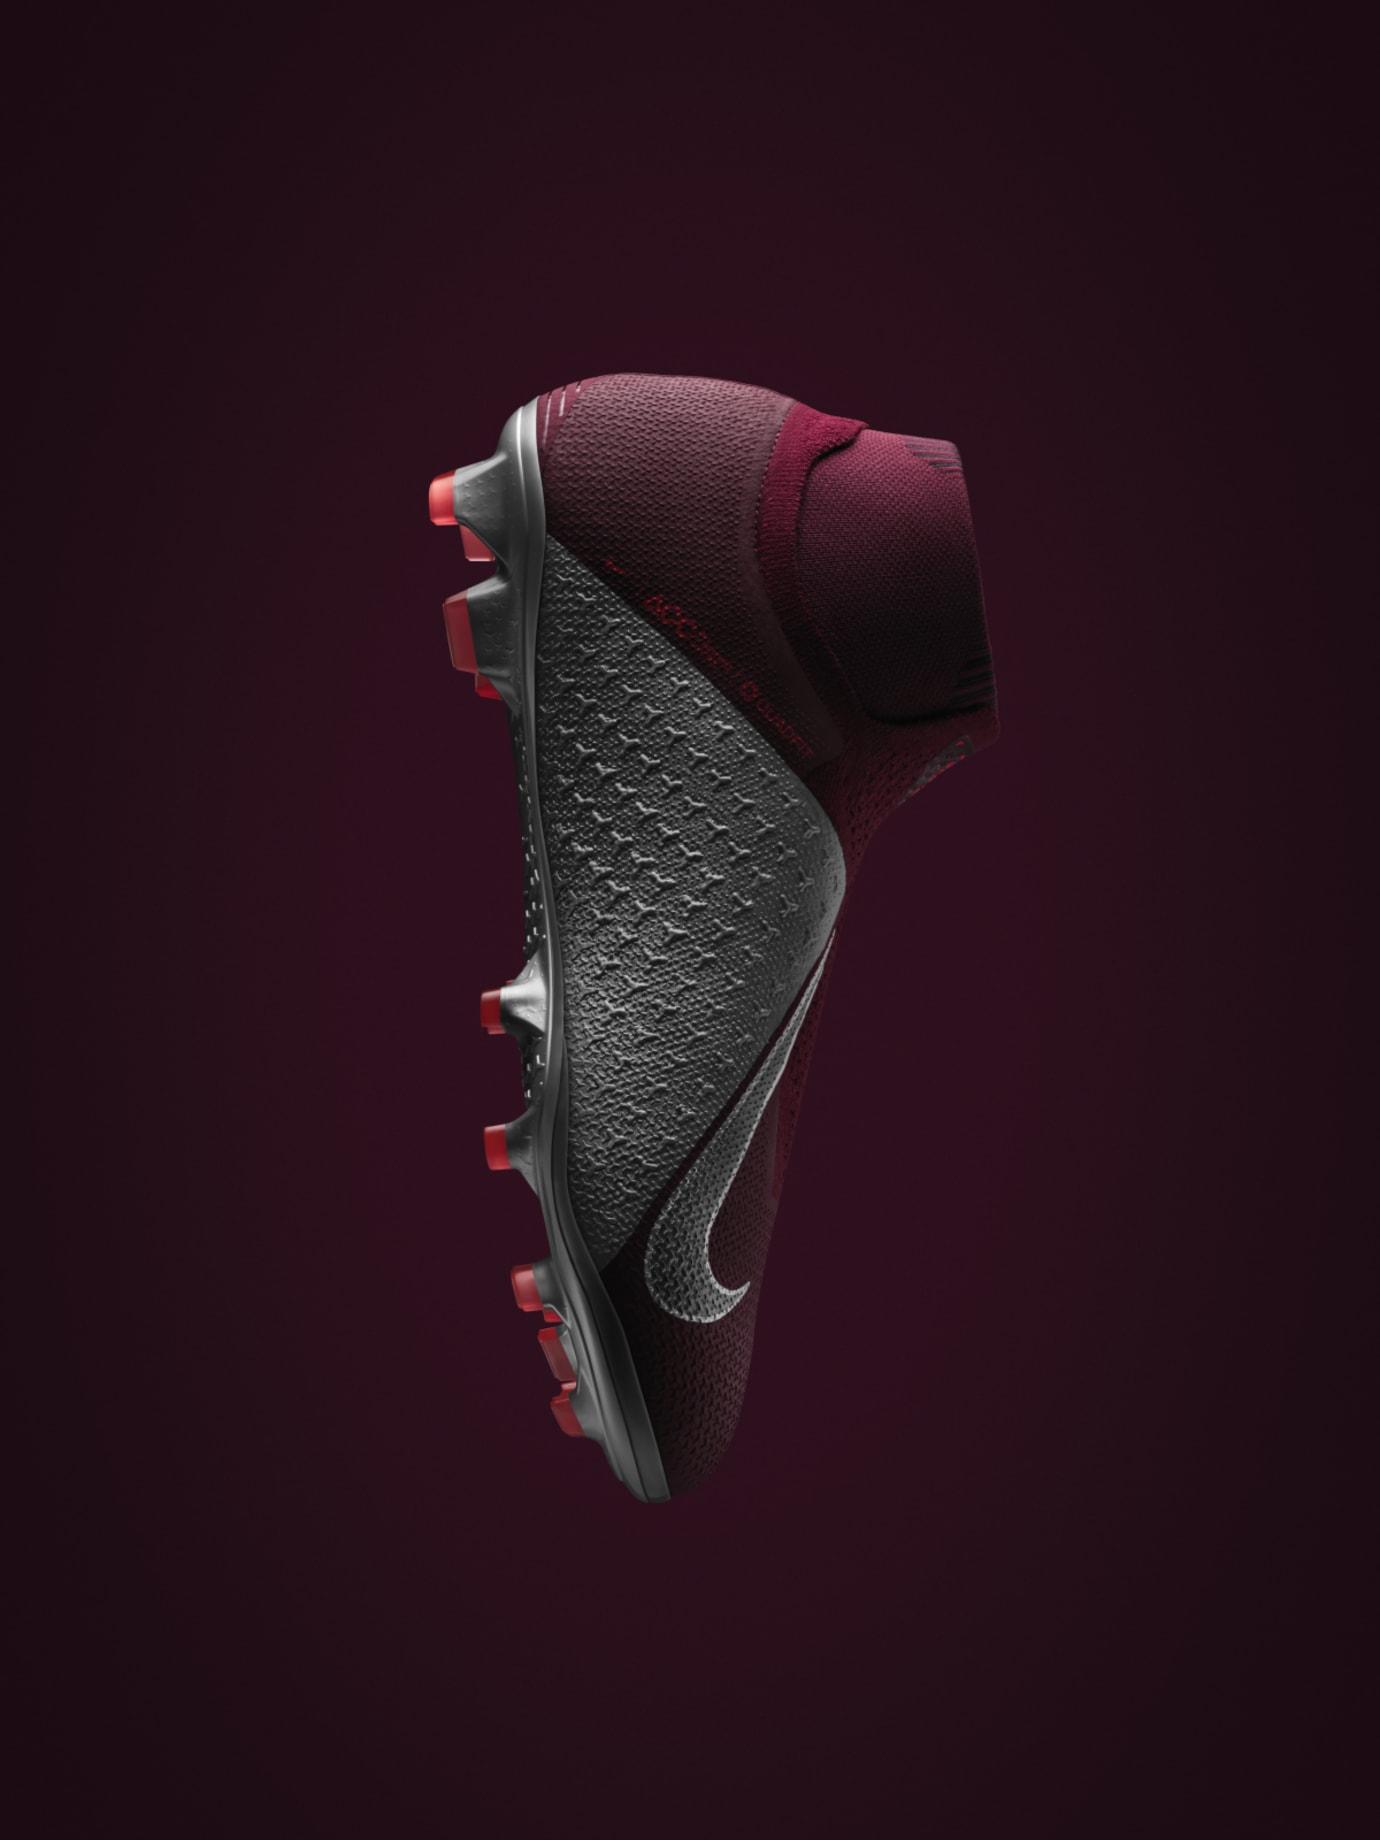 Nike PhantomVSN (Medial)